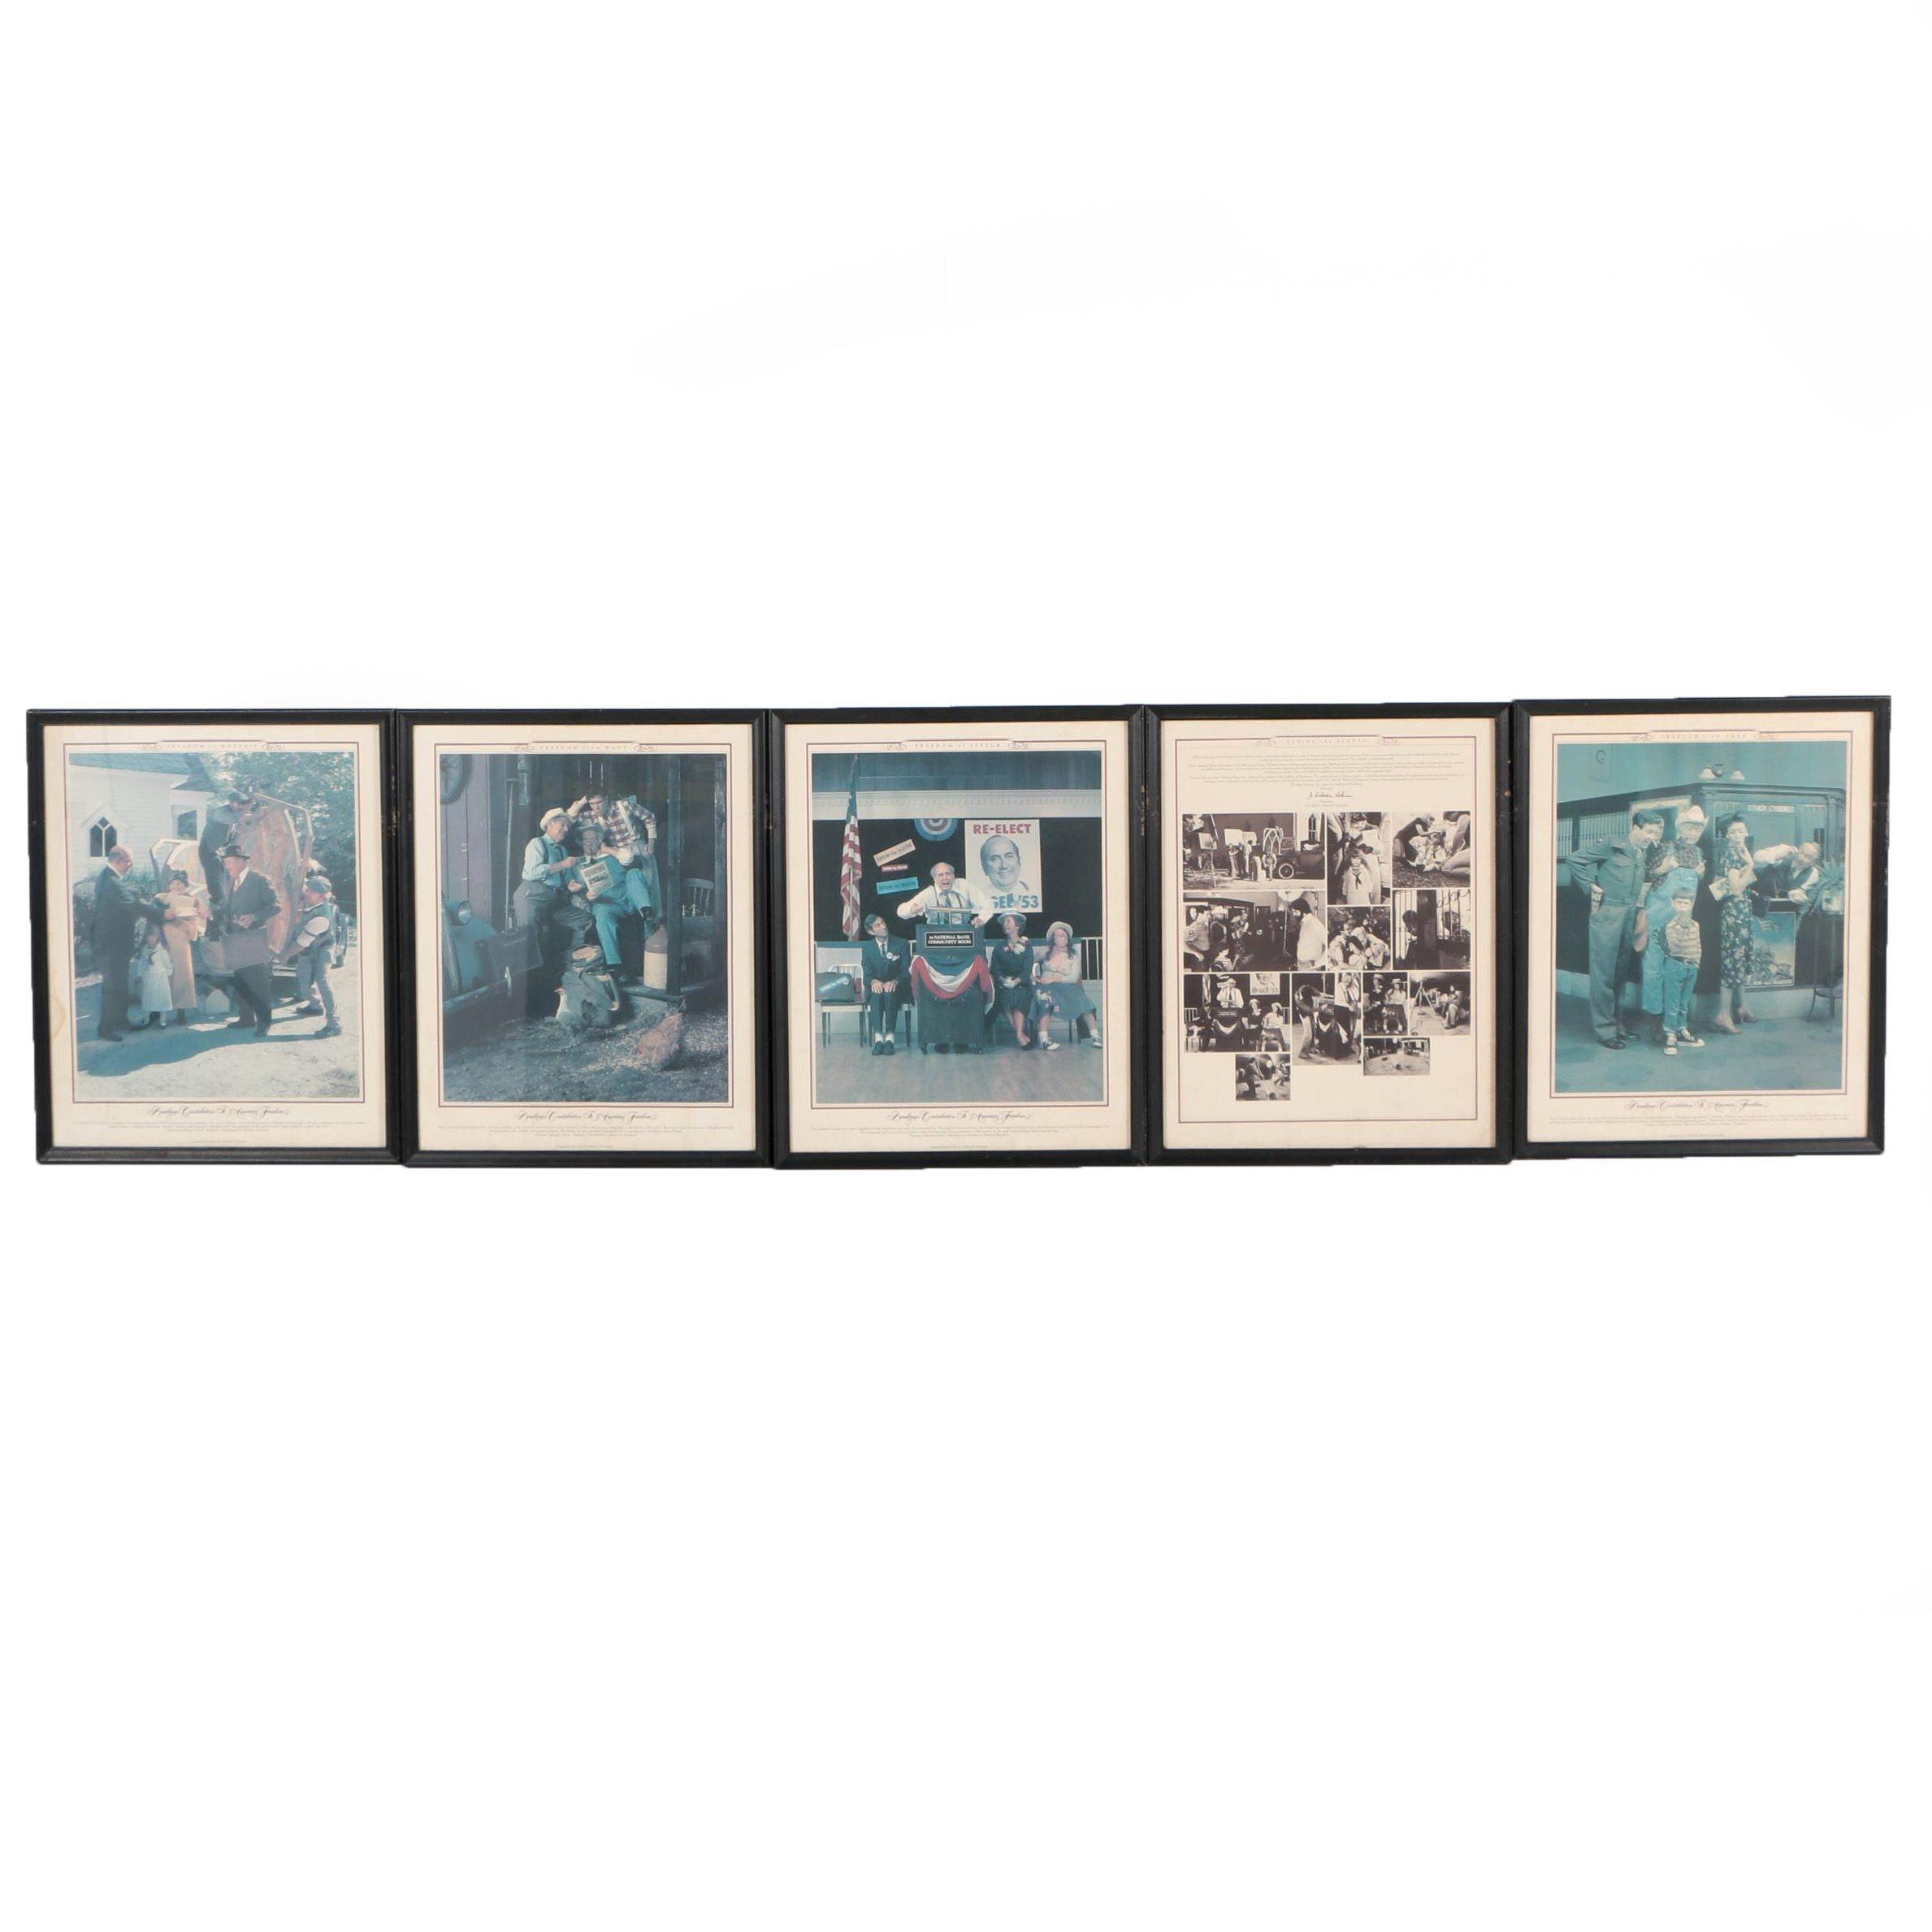 John H. Harland Company Offset Lithographs